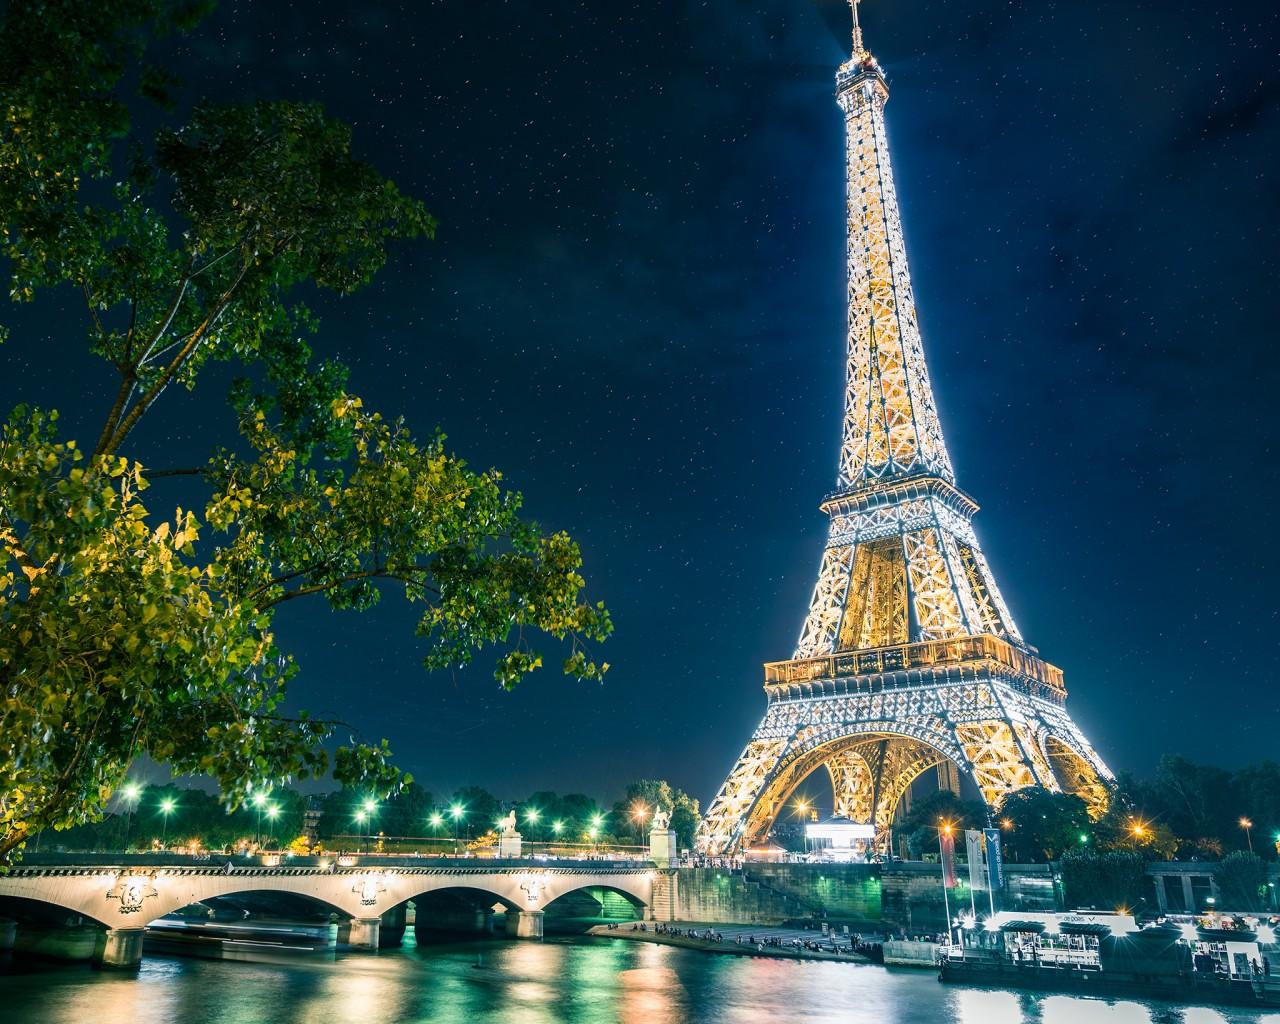 Paris Tour Eiffel 4k Telecharger Fond D Ecran Paris 1280x1024 Wallpapertip